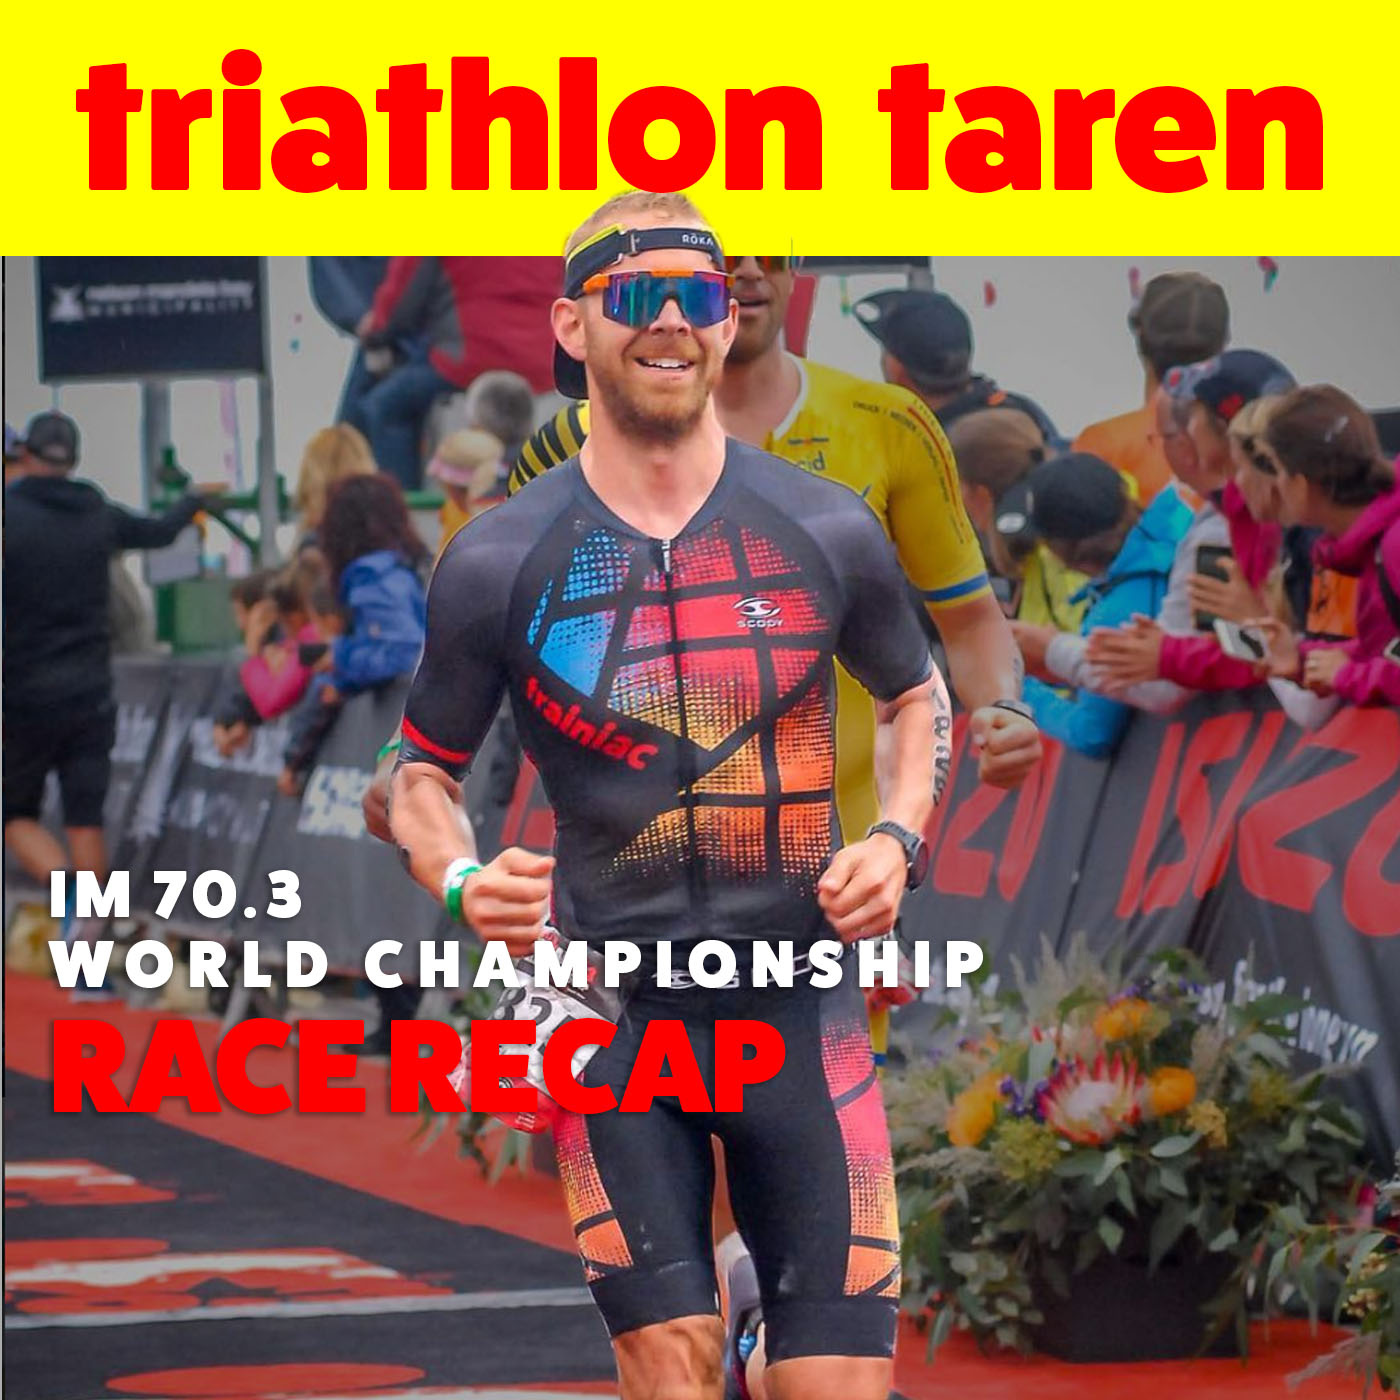 Ironman 70.3 World Championship Race Recap